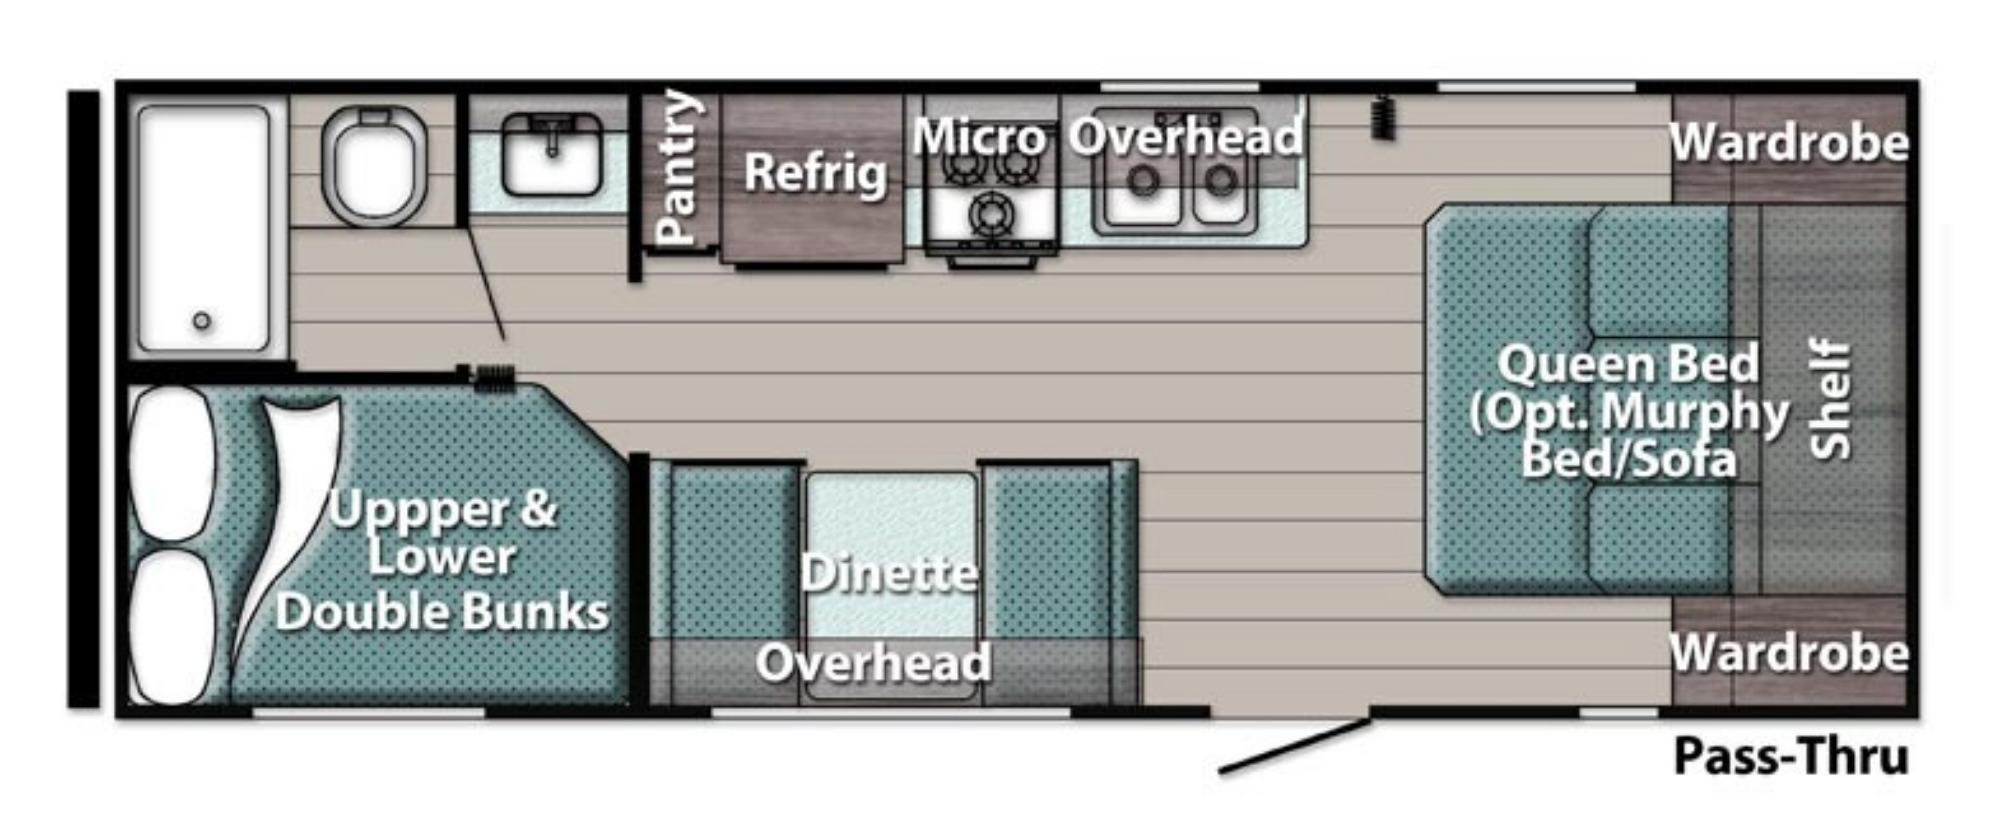 View Floor Plan for 2021 GULF STREAM AMERI-LITE 248BH